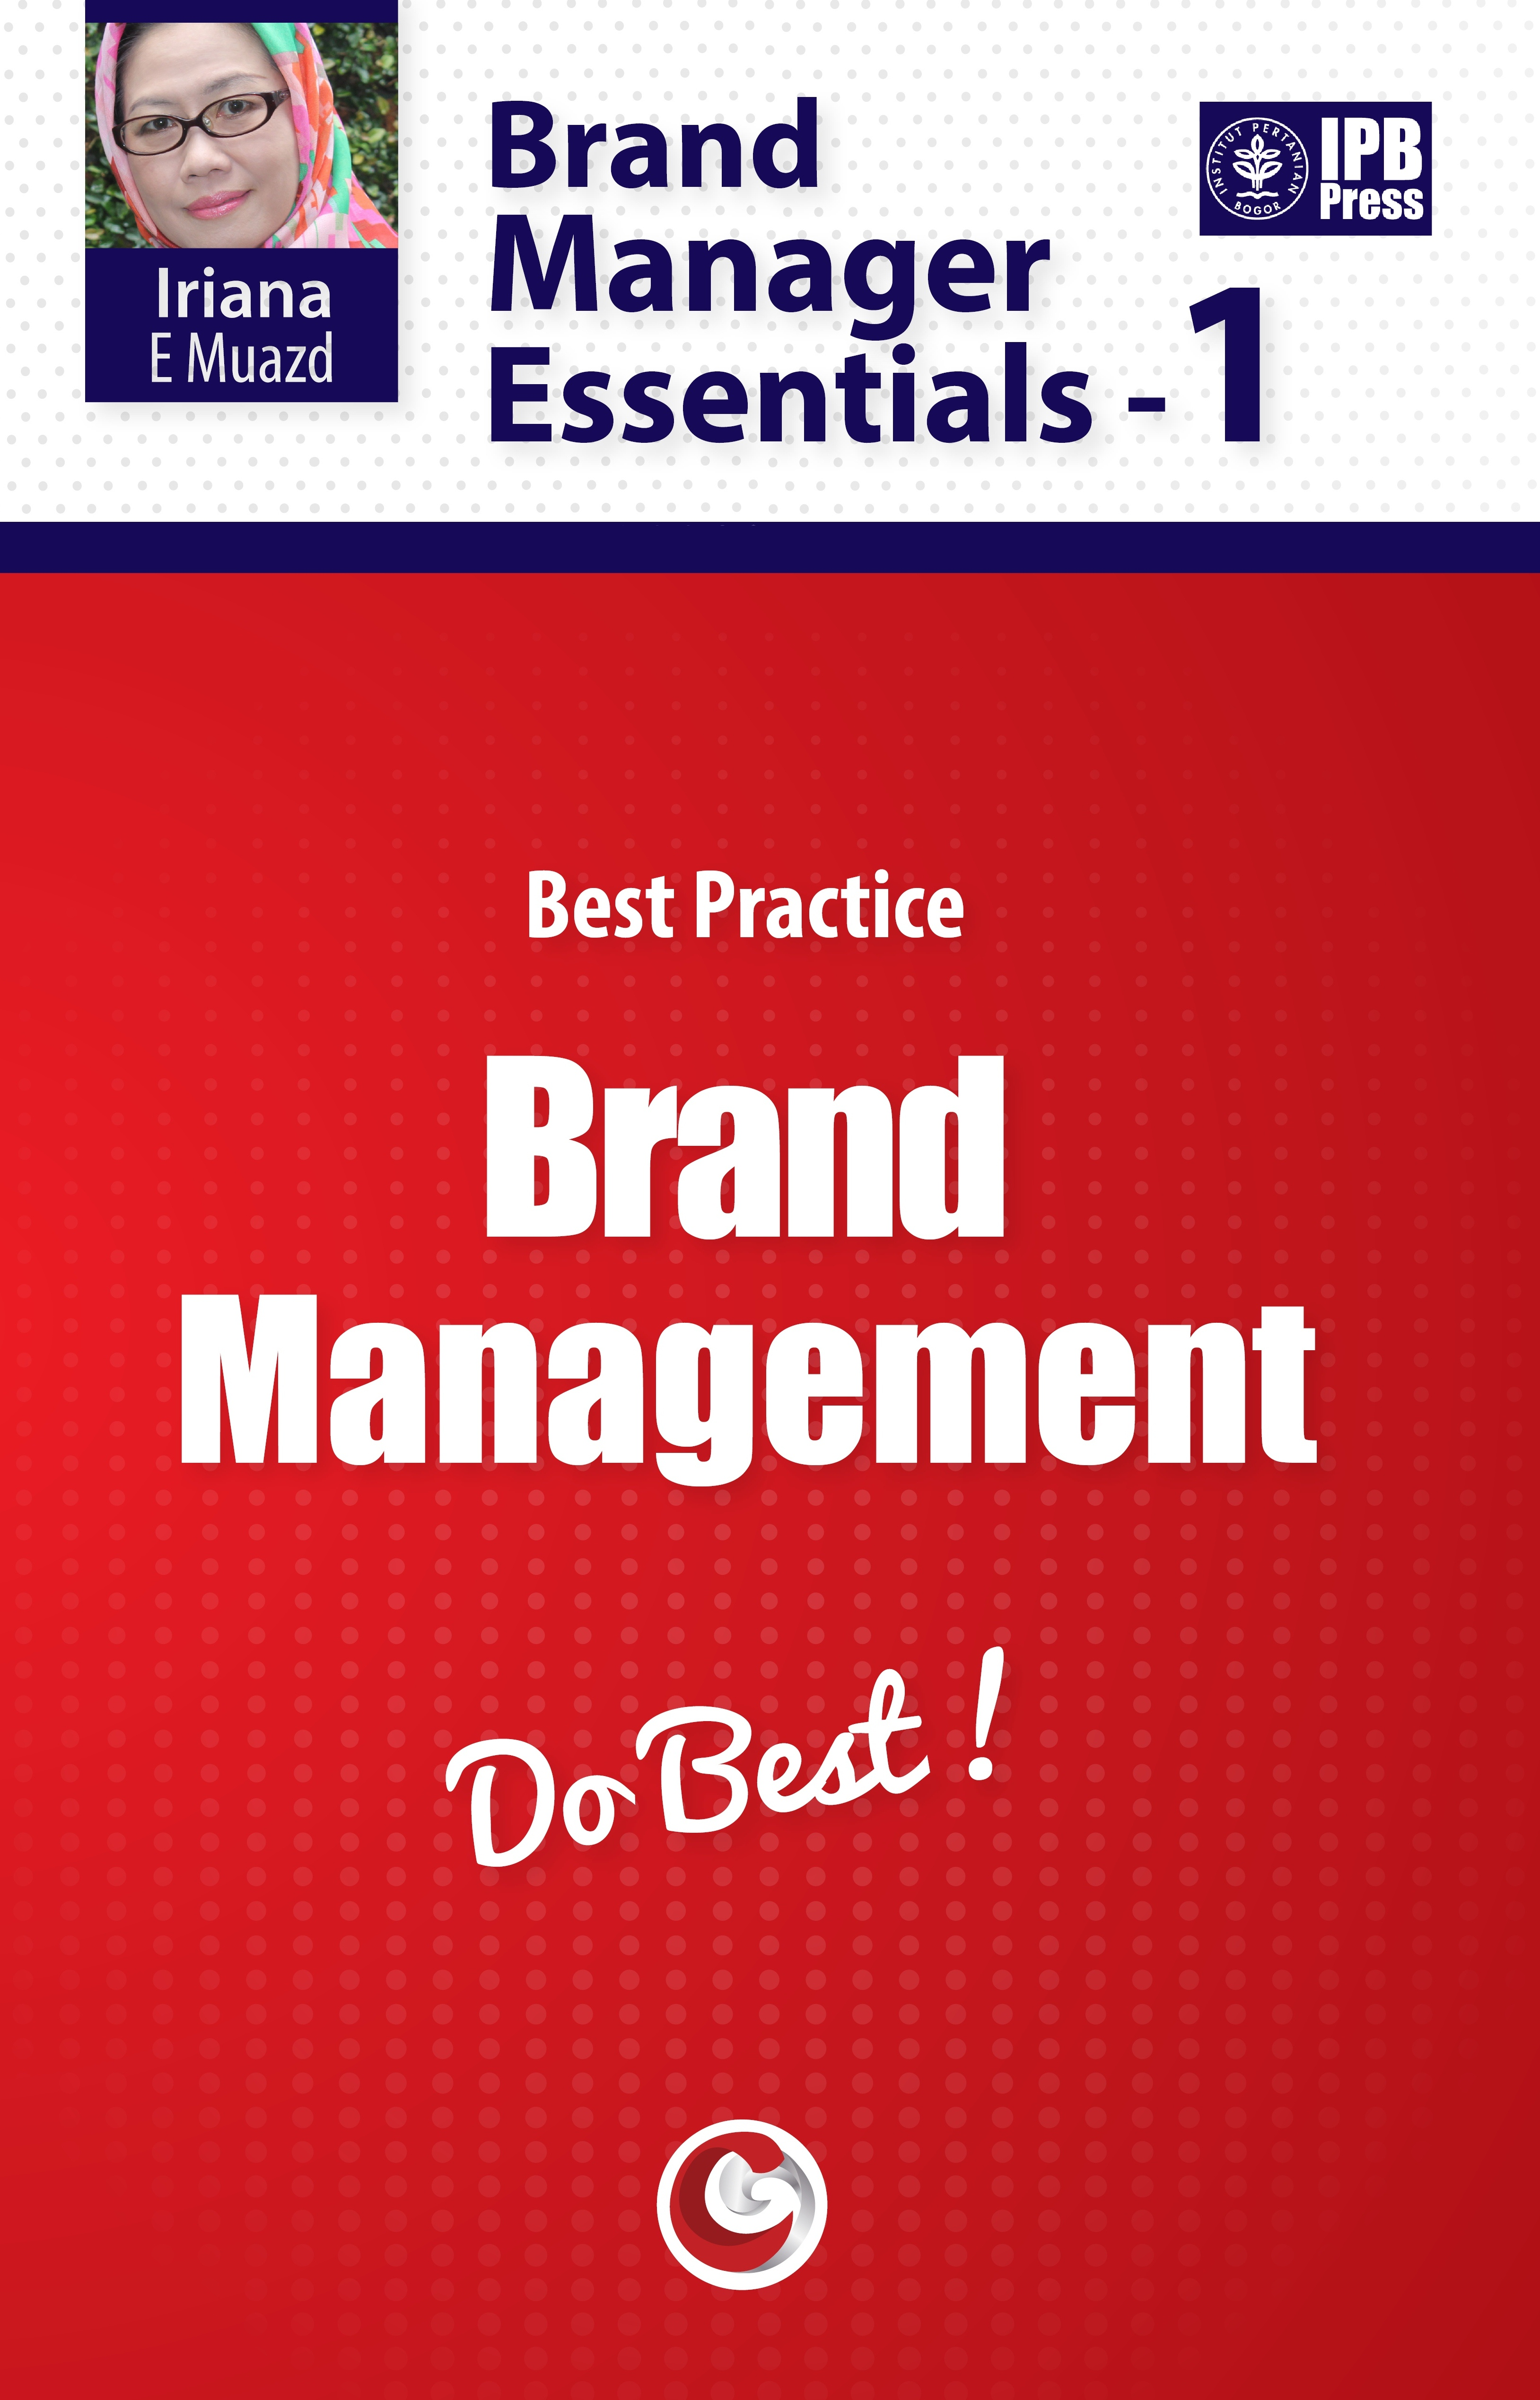 Brand manager essentials - 1: [sumber elektronis]